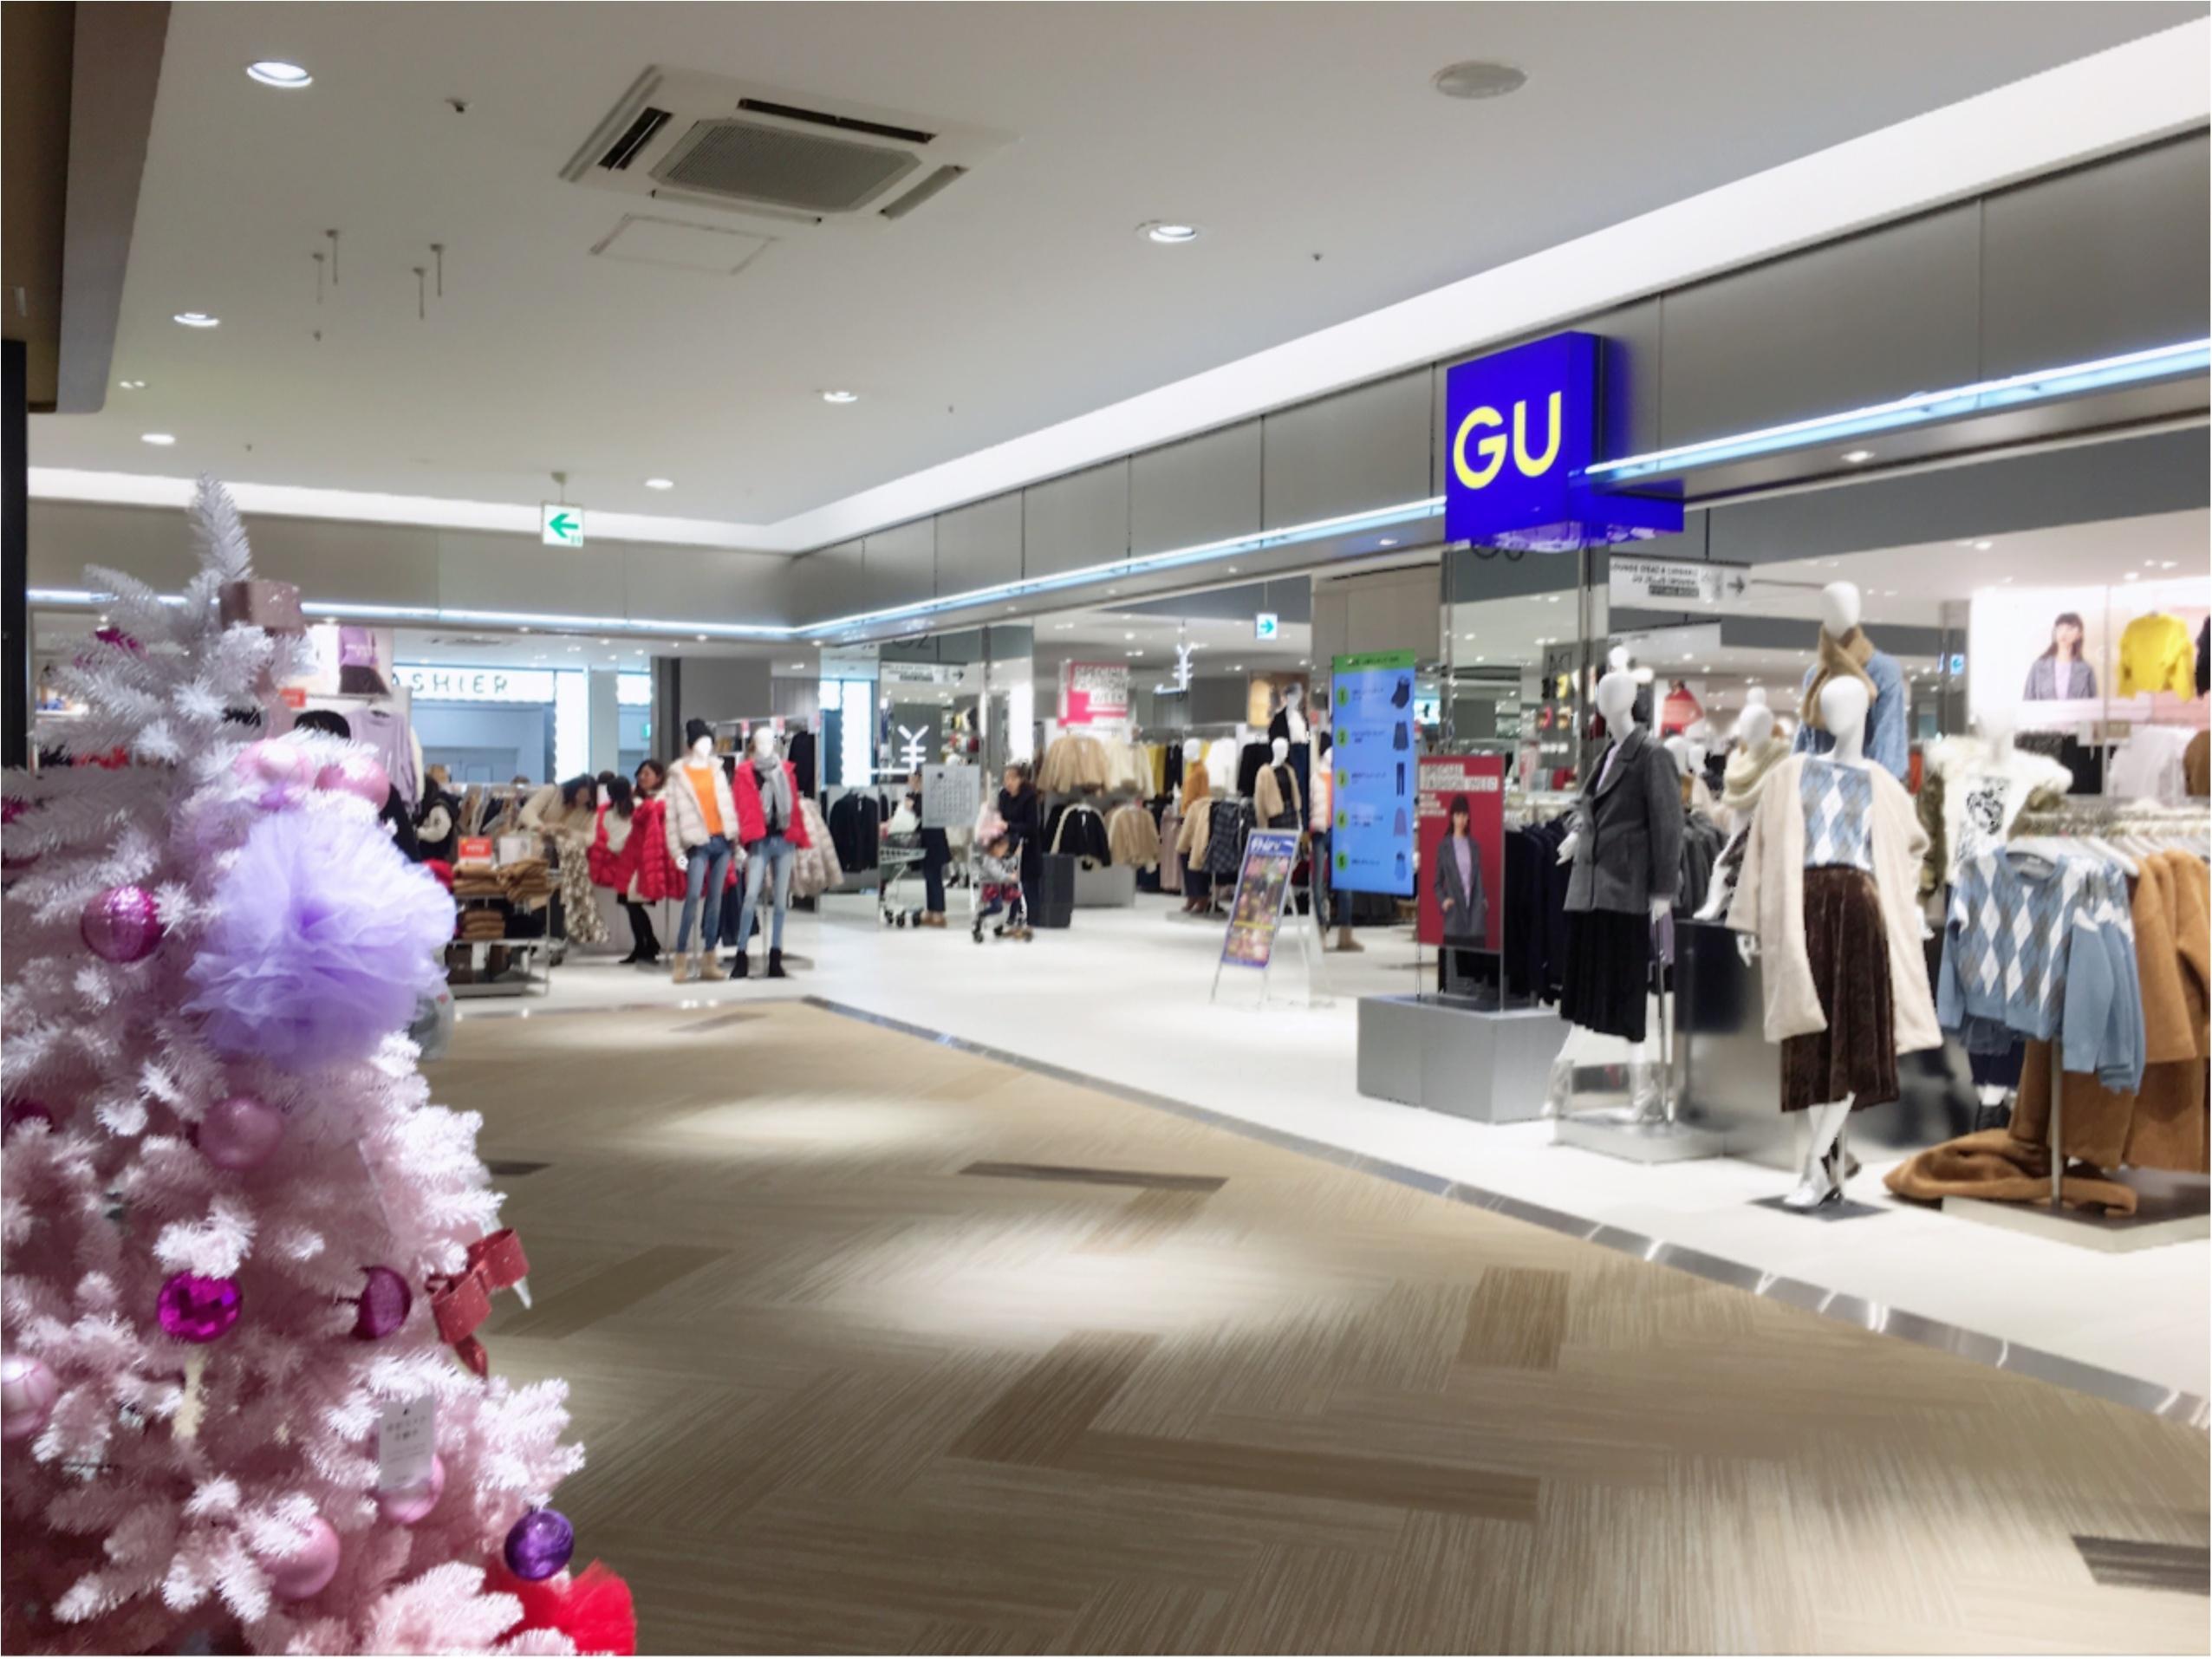 【GU(ジーユー)】全国に2店舗!「超」大型店へ。限定商品の見分け方、教えます。_1